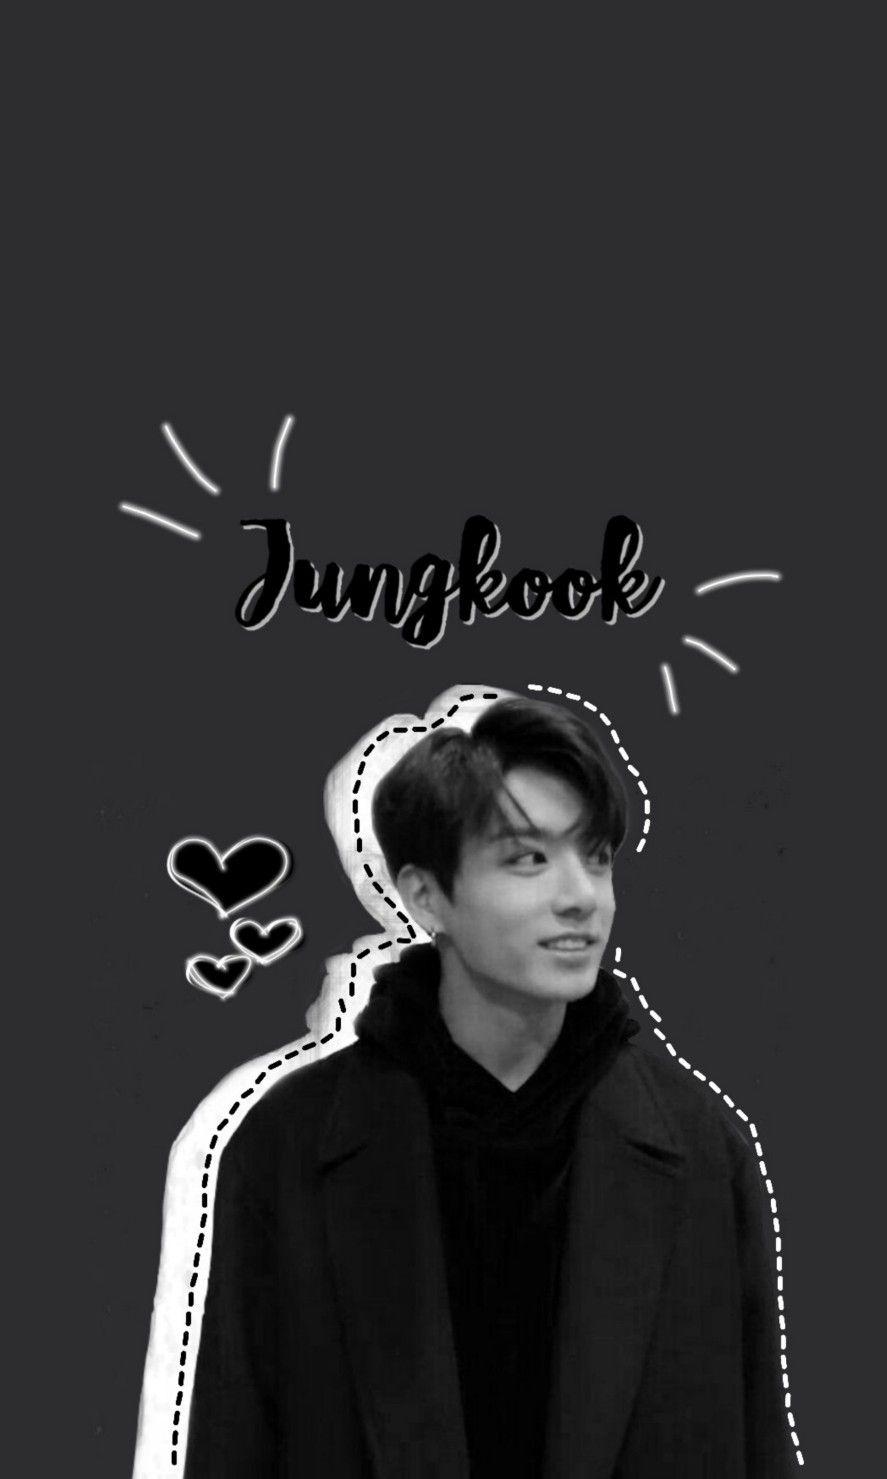 Jungkook Bts Btswallpaper Black White Aesthetic Jungkook Black And White Wallpaper Aesthetic Edit Gambar Gambar Wajah Bts